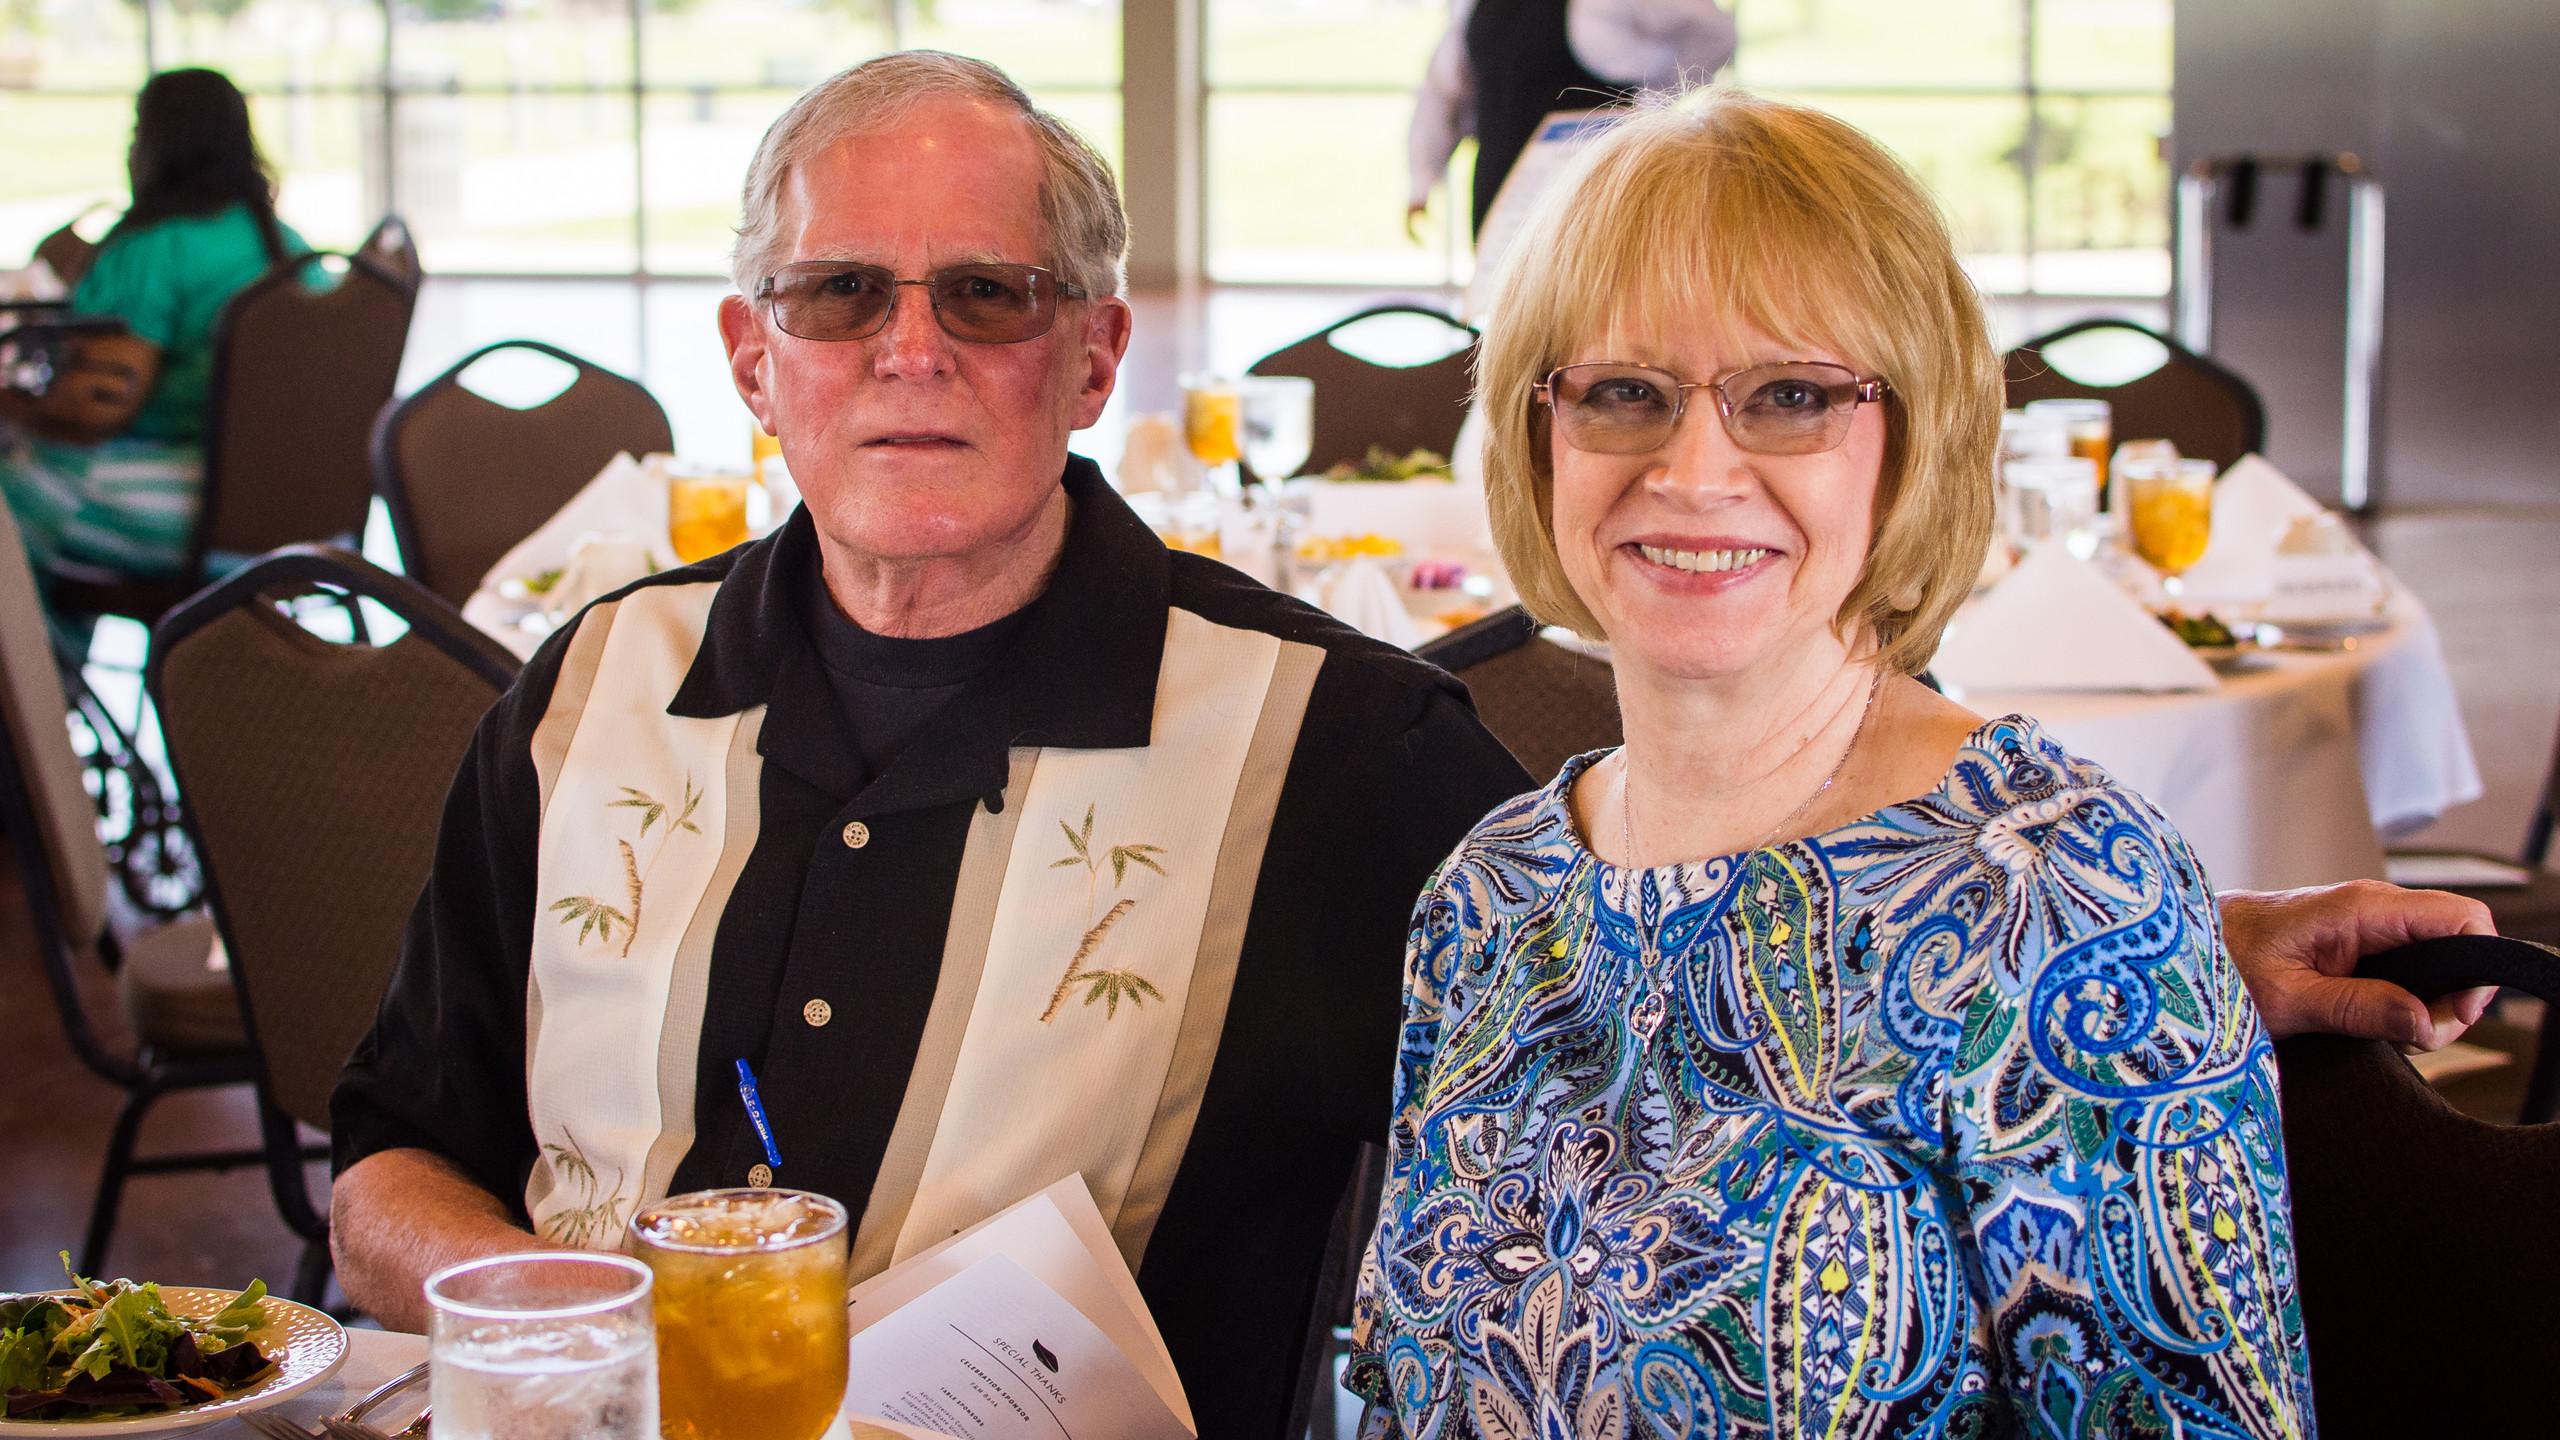 Robert Thompson and Anita Atchley